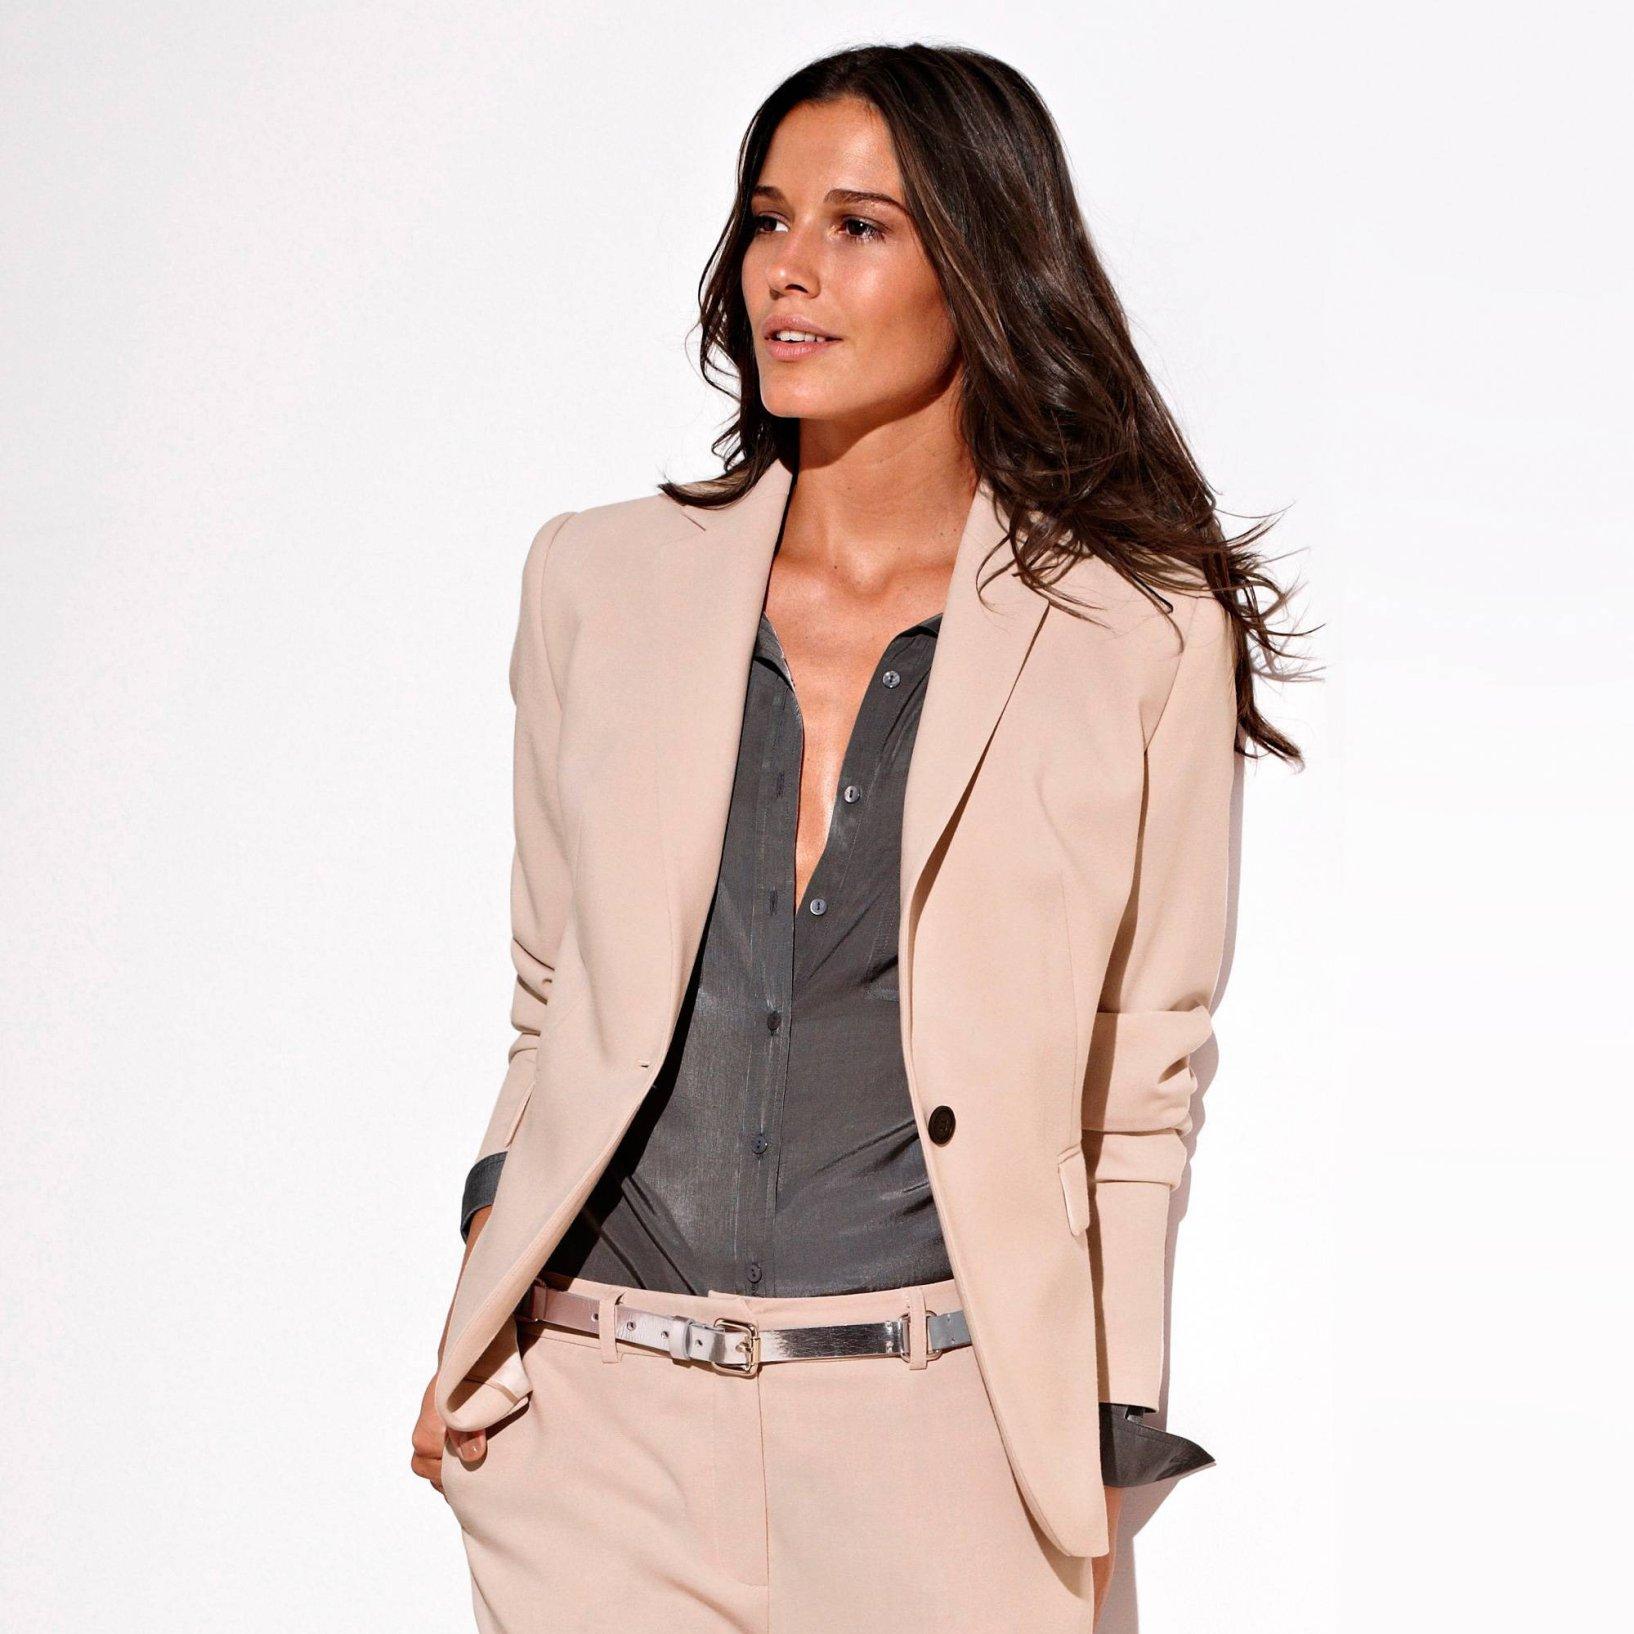 Image de veste femme